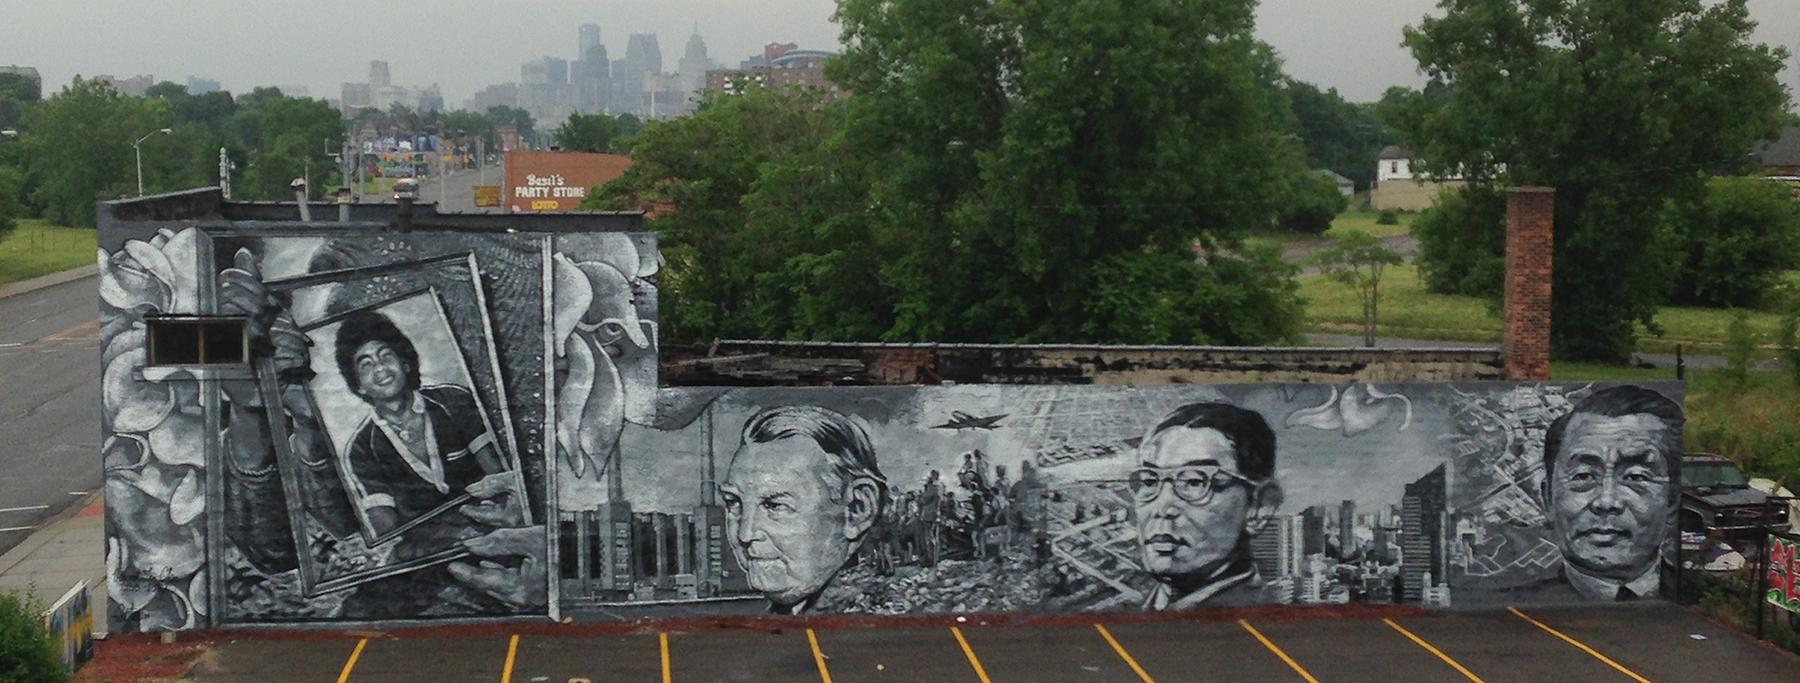 gaia-new-mural-in-detroit-usa-01